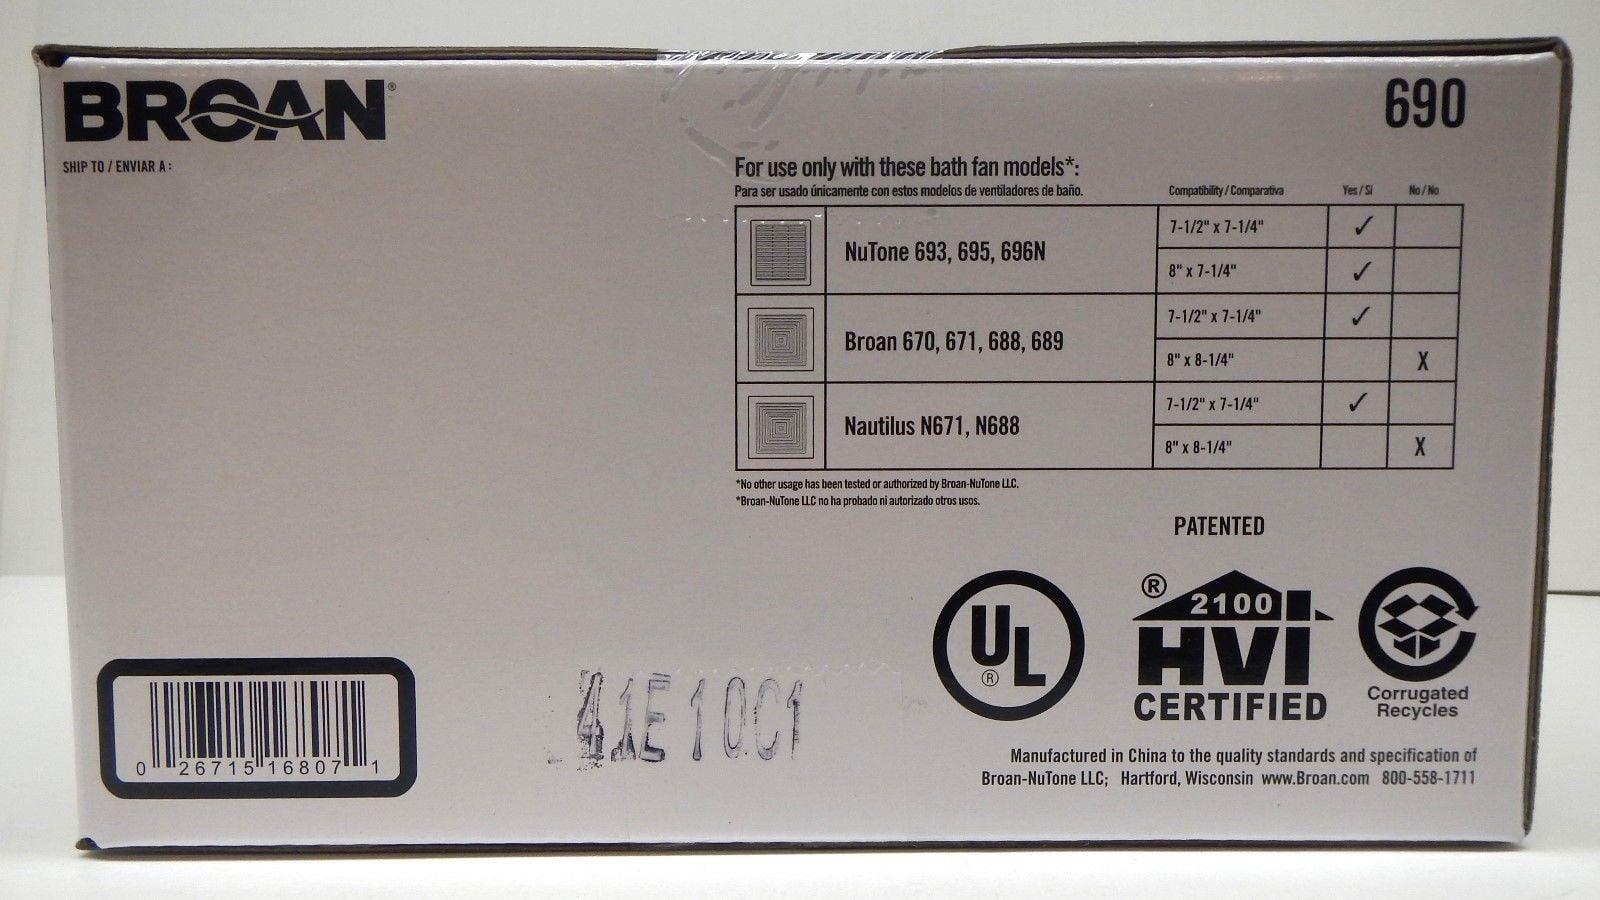 nutone broan nautilus bath fan upgrade kit 690nt for 693 695 696 670 671 688 689 walmartcom